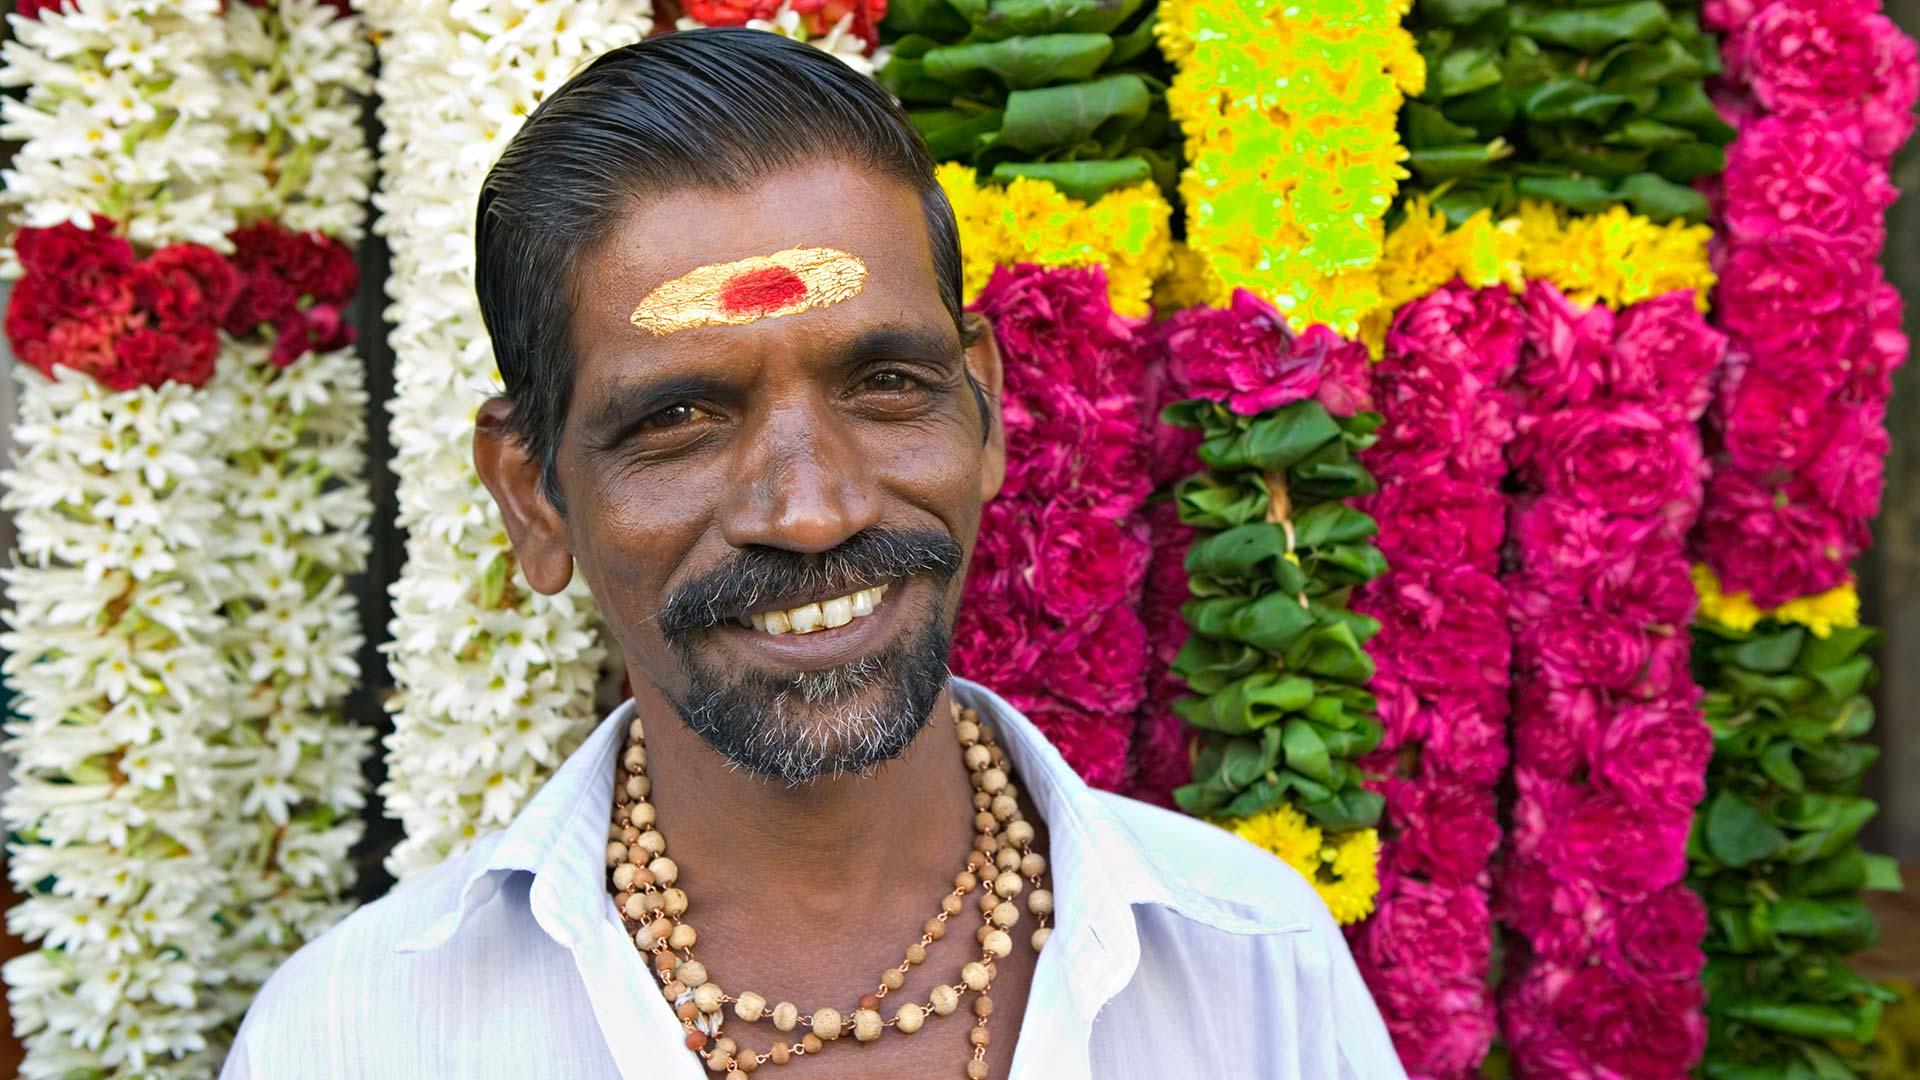 Flower seller at the Kapaleeshwarar Temple in Chennai, India